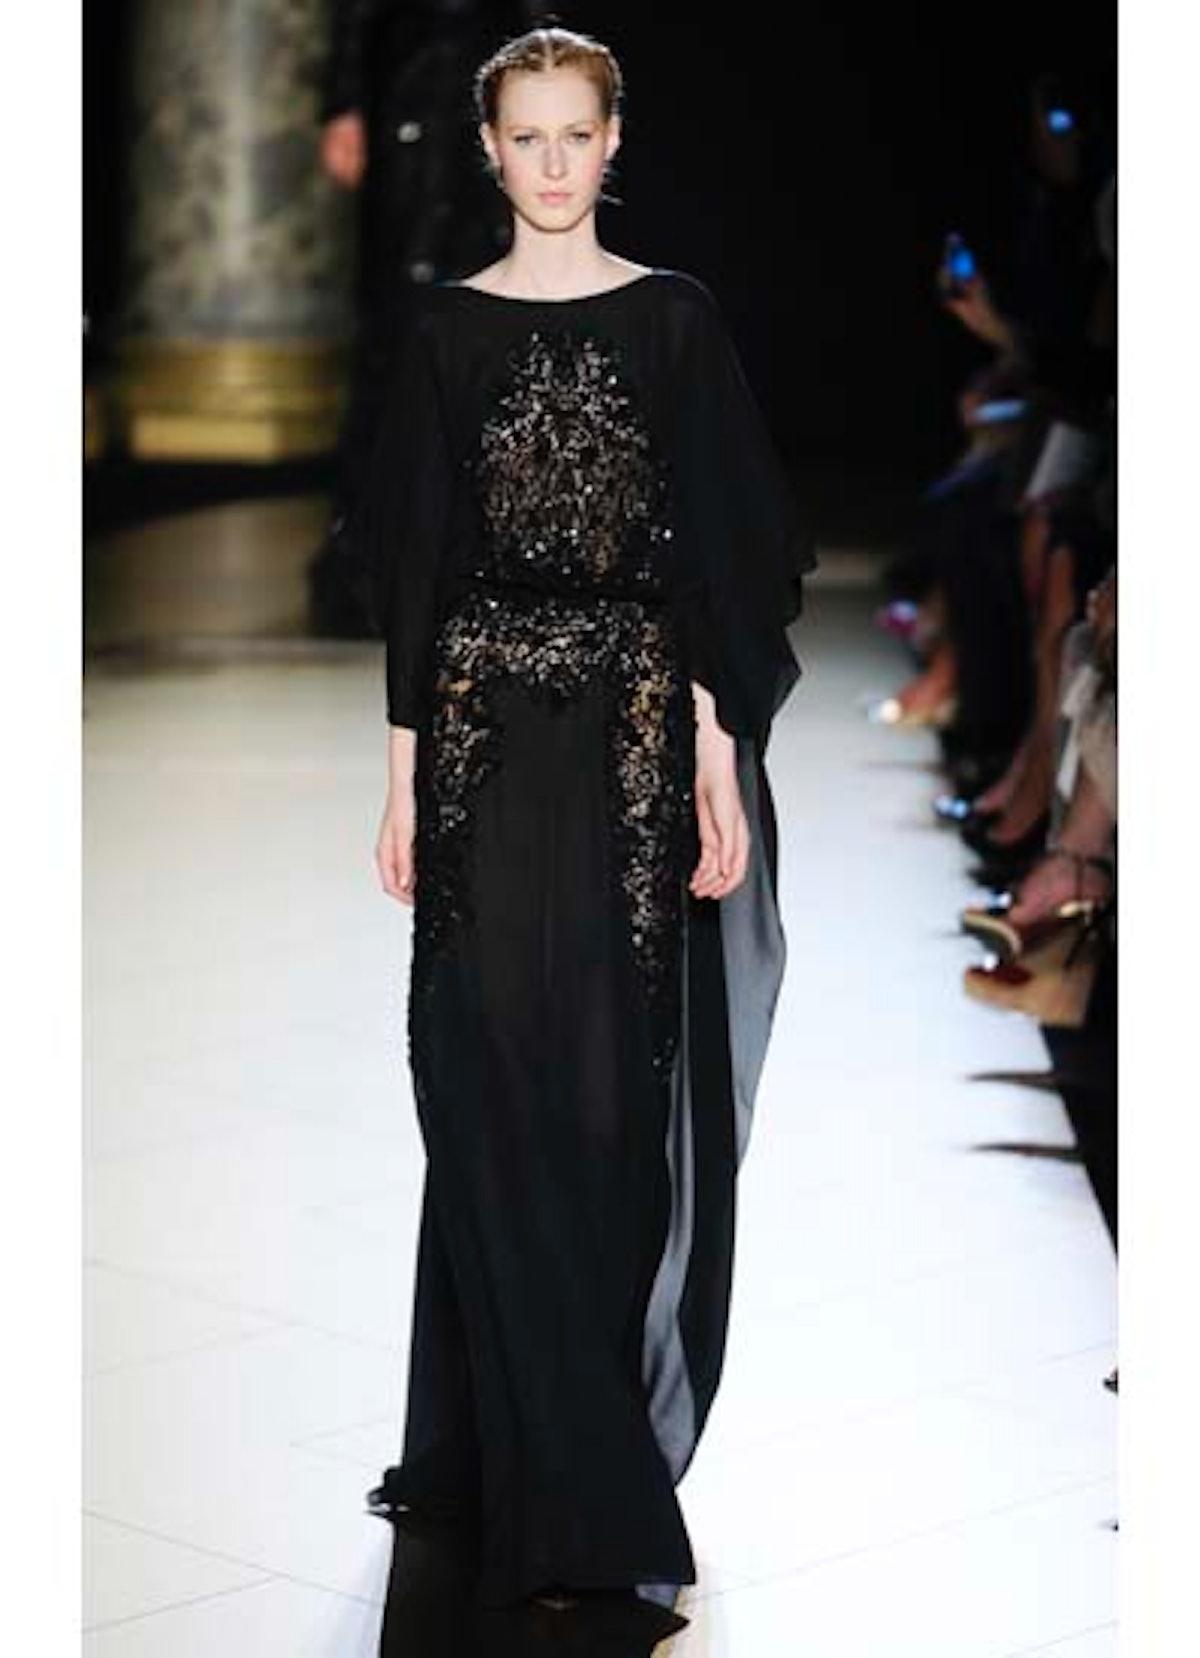 fass-elie-saab-couture-2012-runway-04-v.jpg